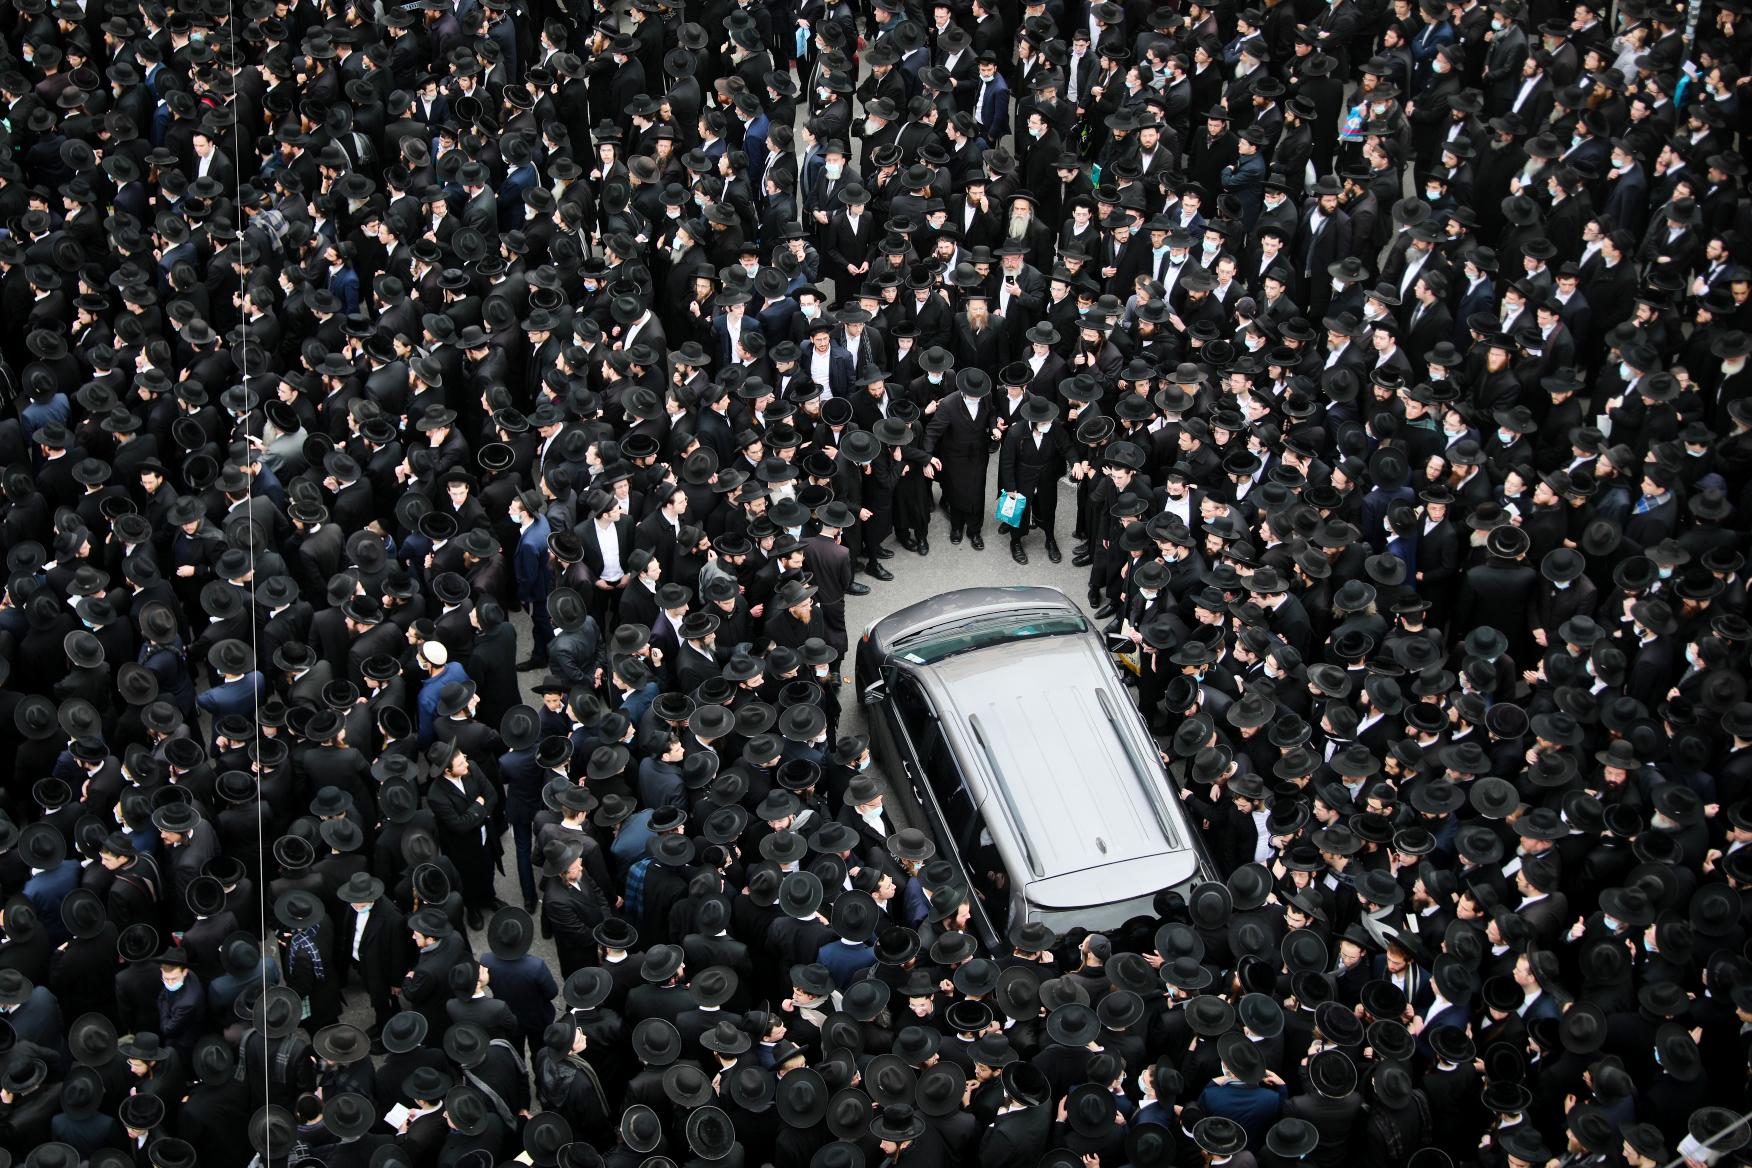 Thousands attend rabbi's funeral in Jerusalem, defying lockdown